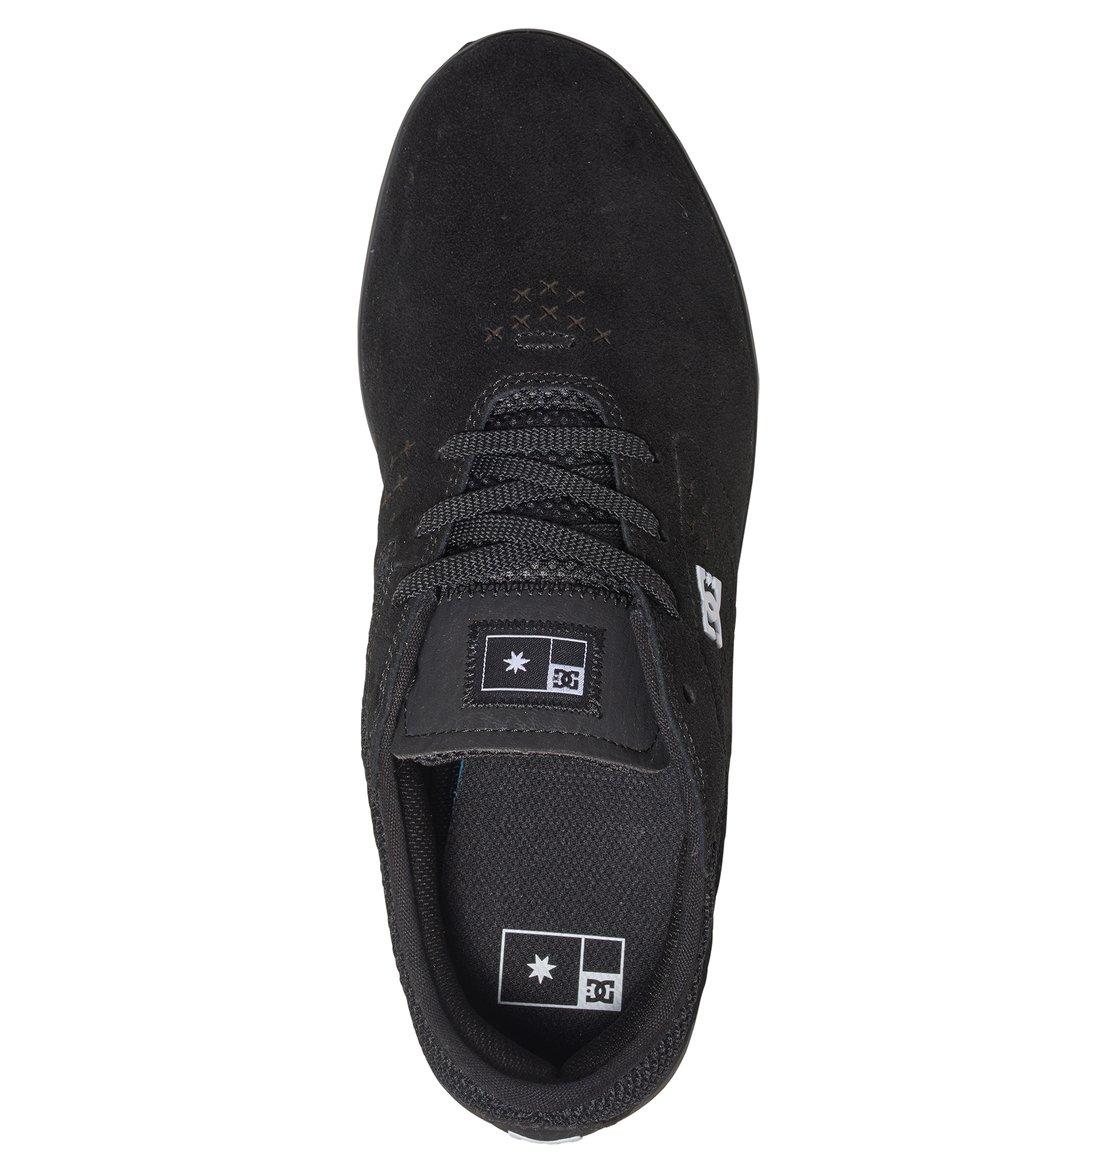 Skate shoes dc - 3 Men S New Jack S Skate Shoes Black Adys100324 Dc Shoes